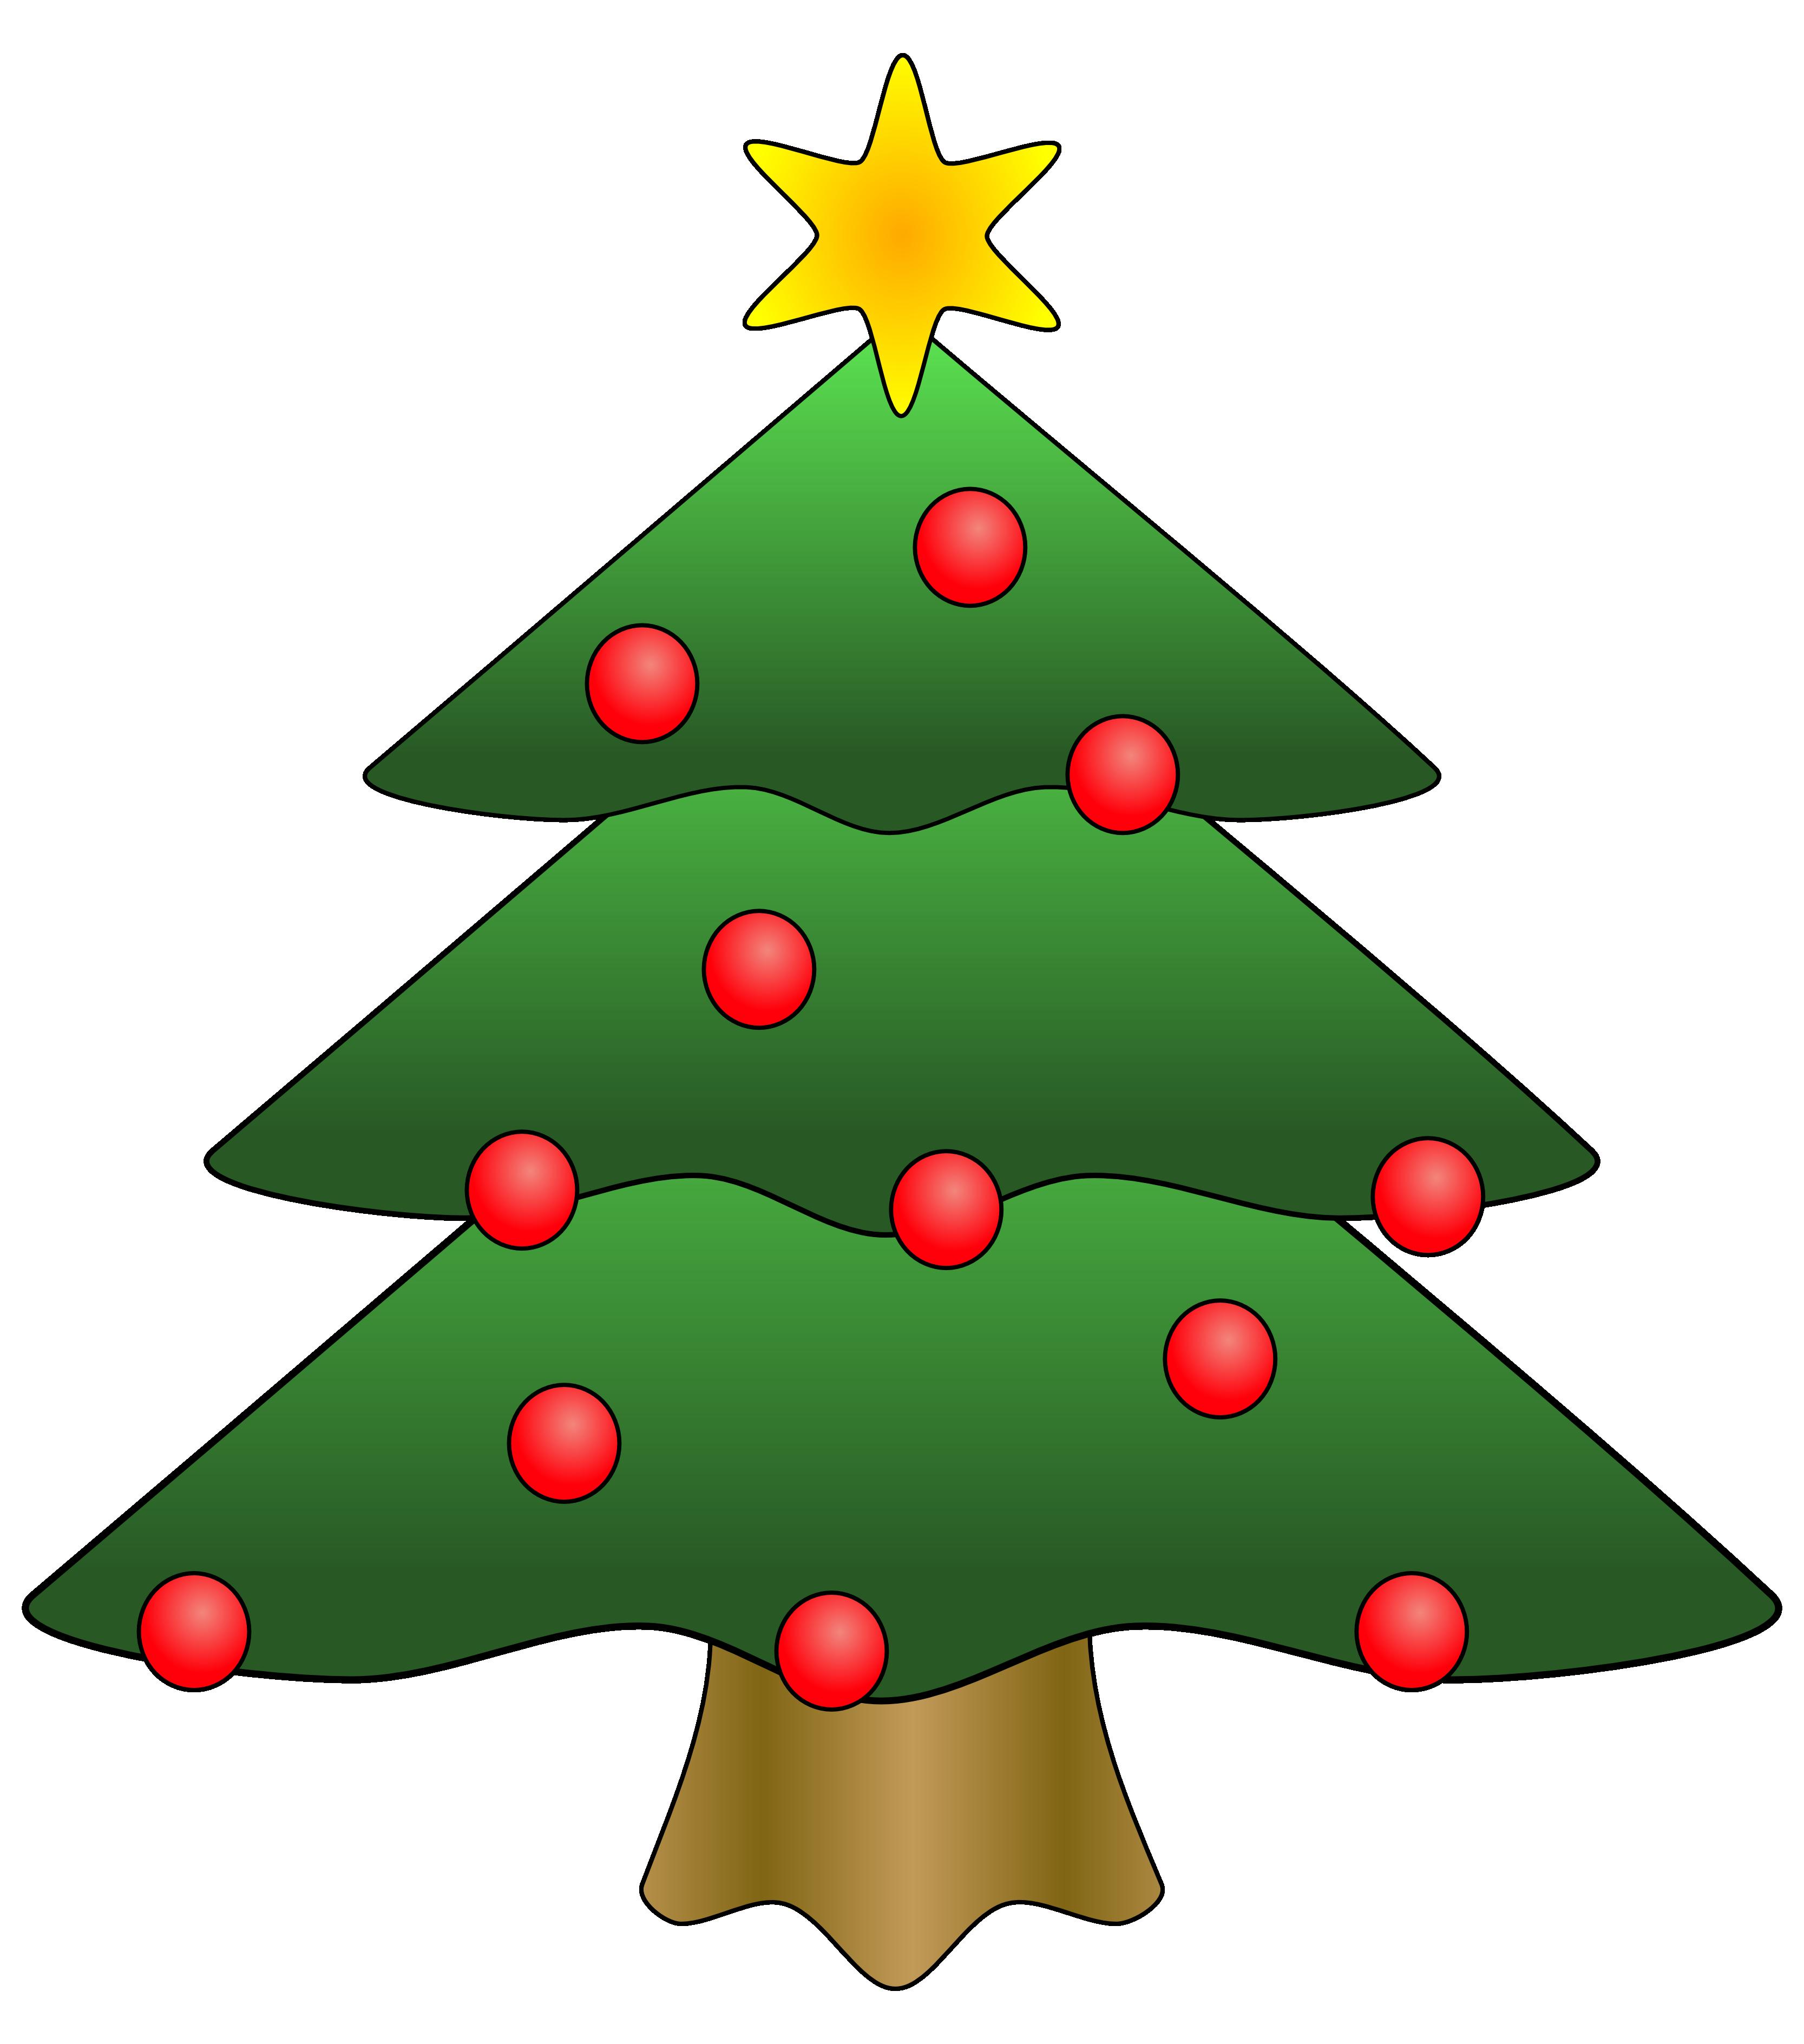 Clip Art Christmas Tree | Clipart Librar-Clip Art Christmas Tree | Clipart library - Free Clipart Images-13